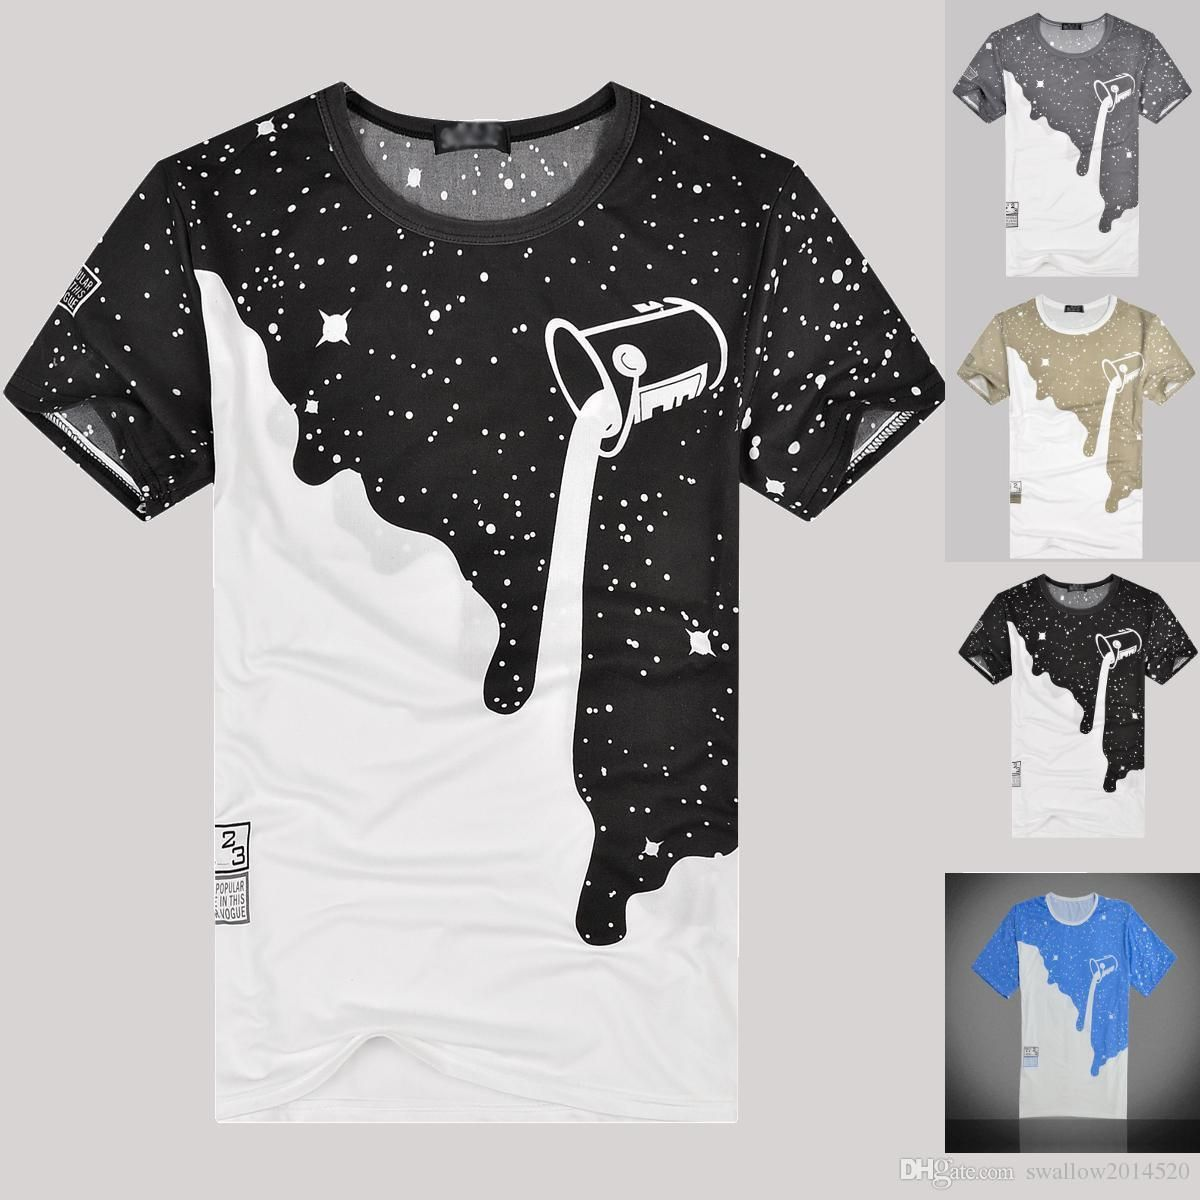 bcfe4d2acc38 New 2018 Mens Summer Tees Plus Size O-neck Short Sleeve T Shirt Milk Printed  Cotton T-shirt 3D Designer Clothing M-XXL Golf Tshirt